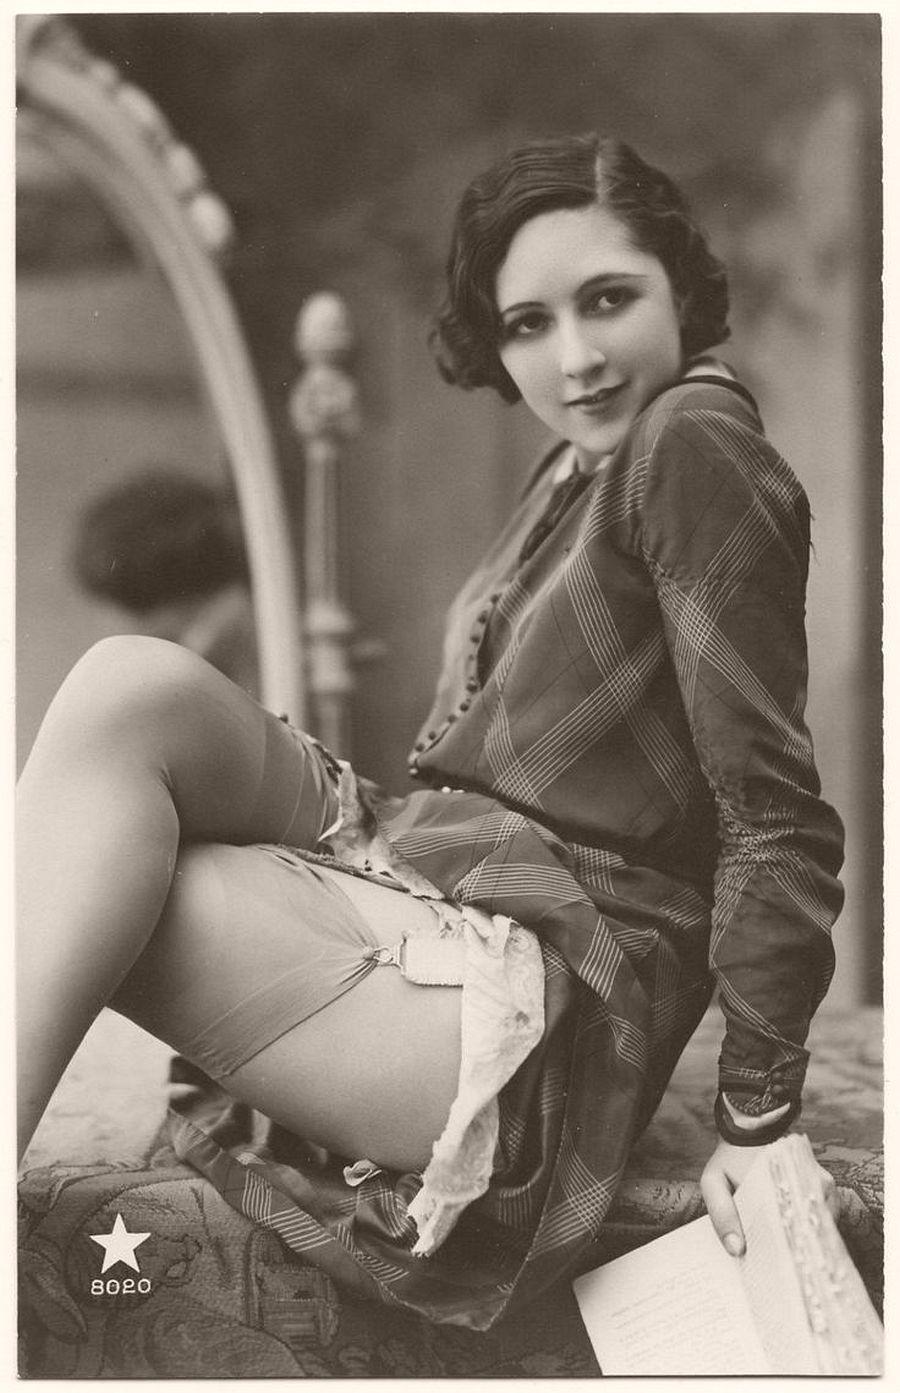 Vintage: Portraits of Lucette Desmoulins by Biederer Brothers (1920s) | MONOVISIONS